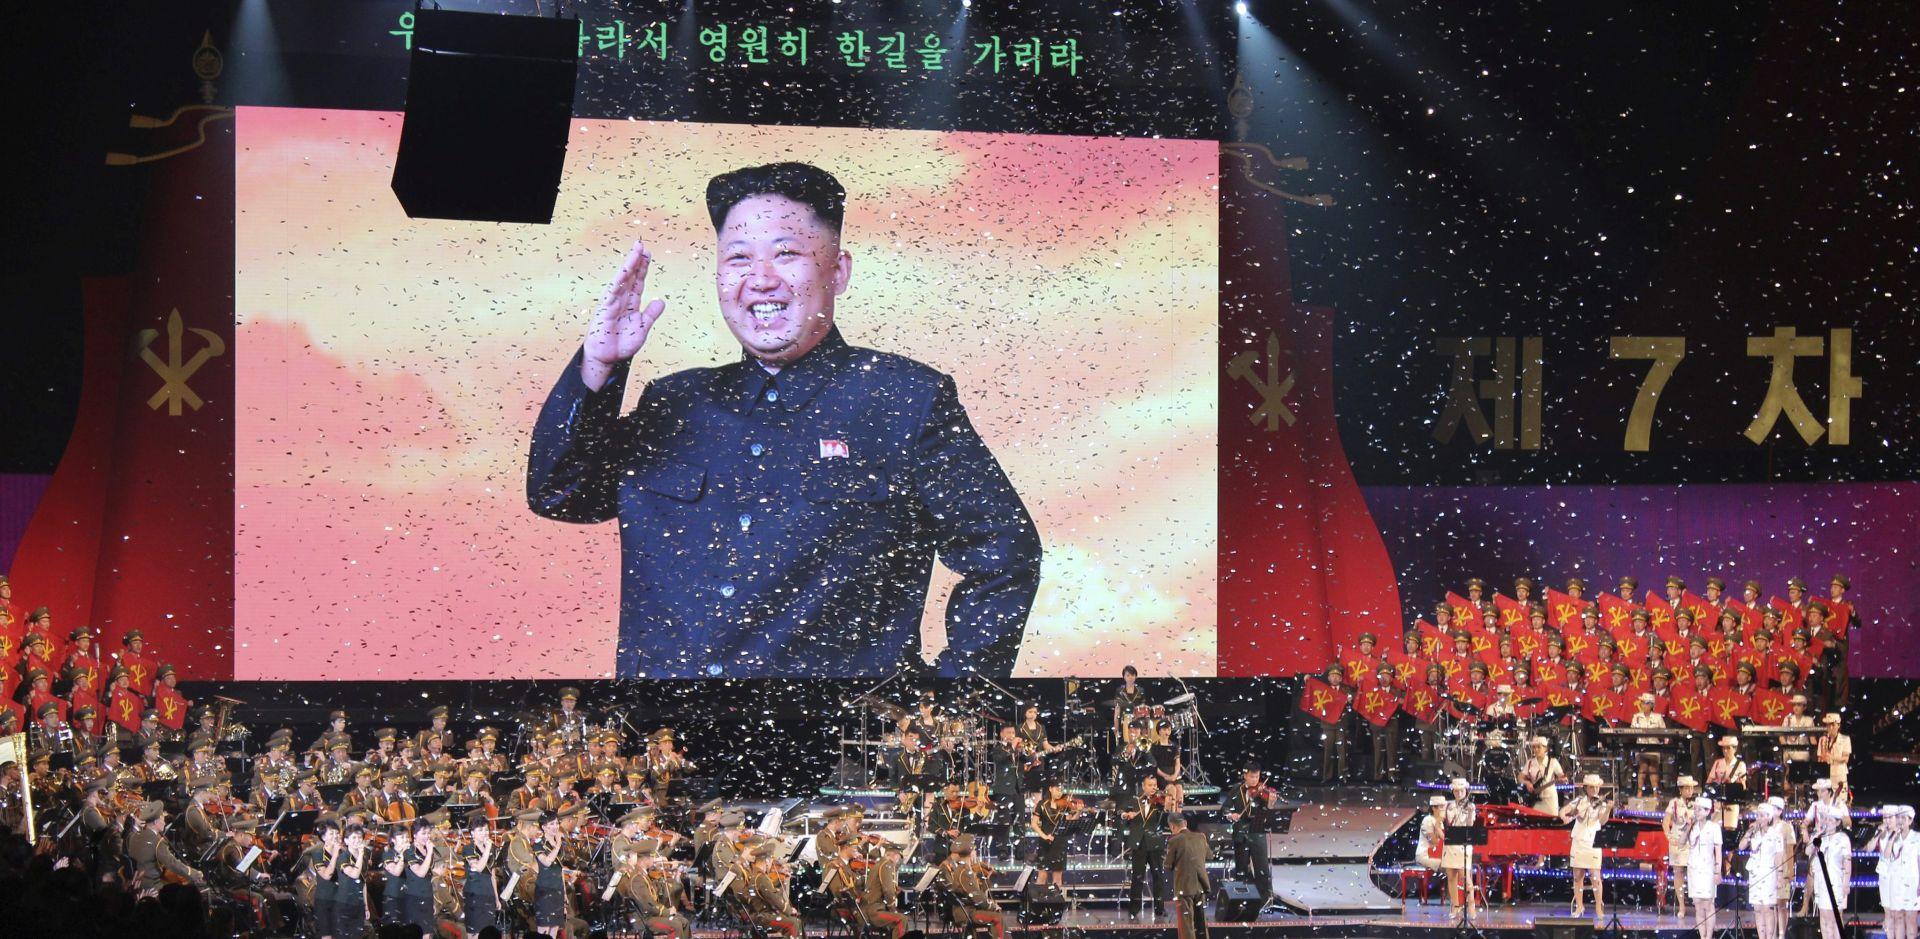 Sjeverna Koreja 'spremna za nuklearni napad'